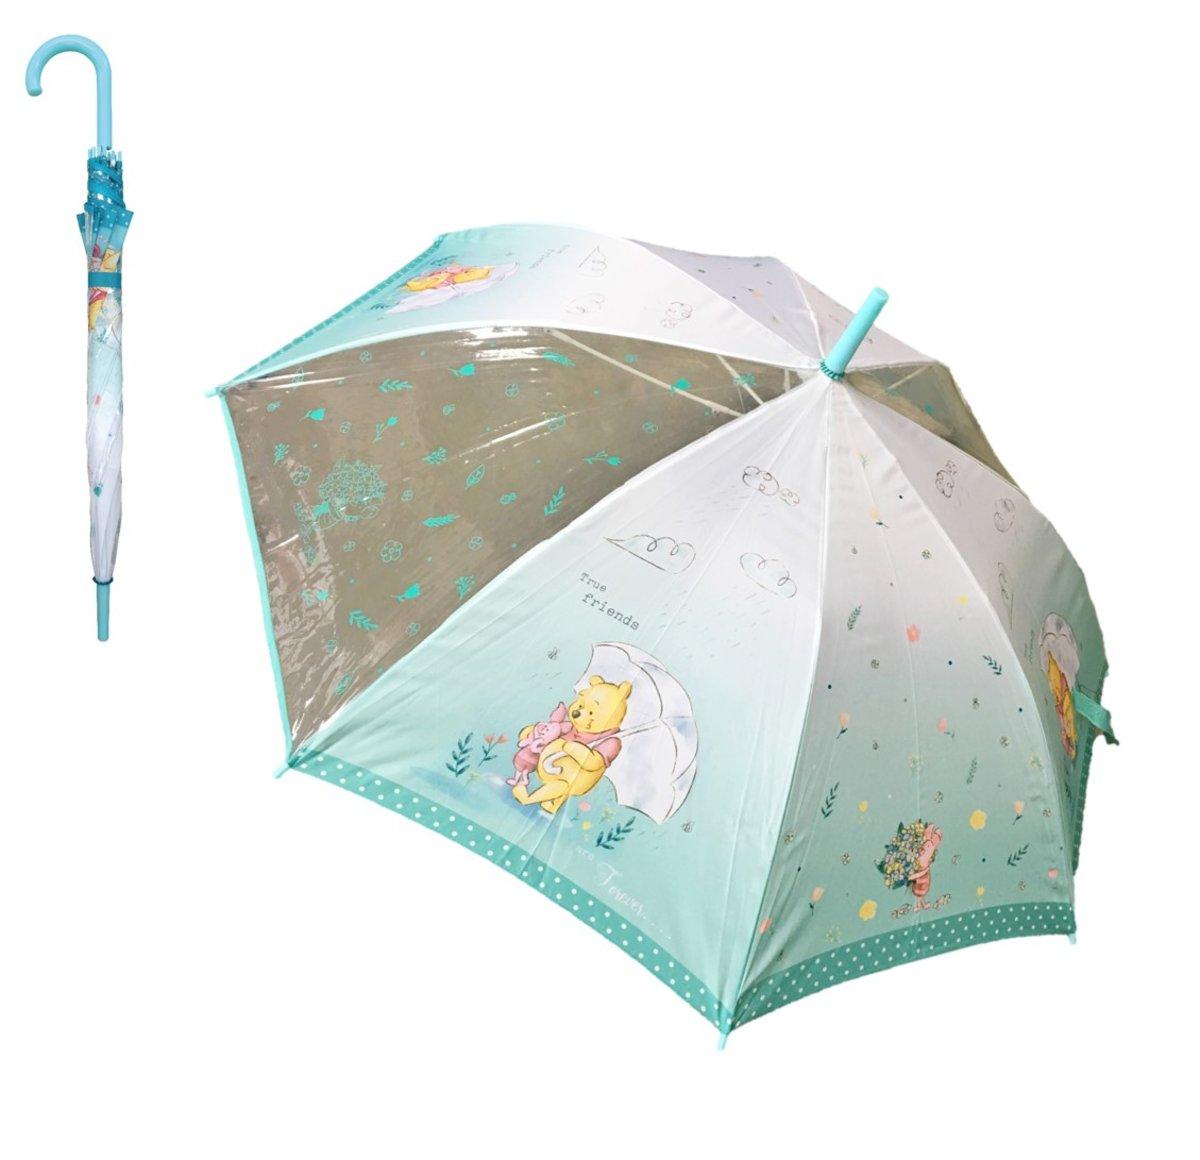 Disney迪士尼 --straight umbrella (Licensed by Disney)